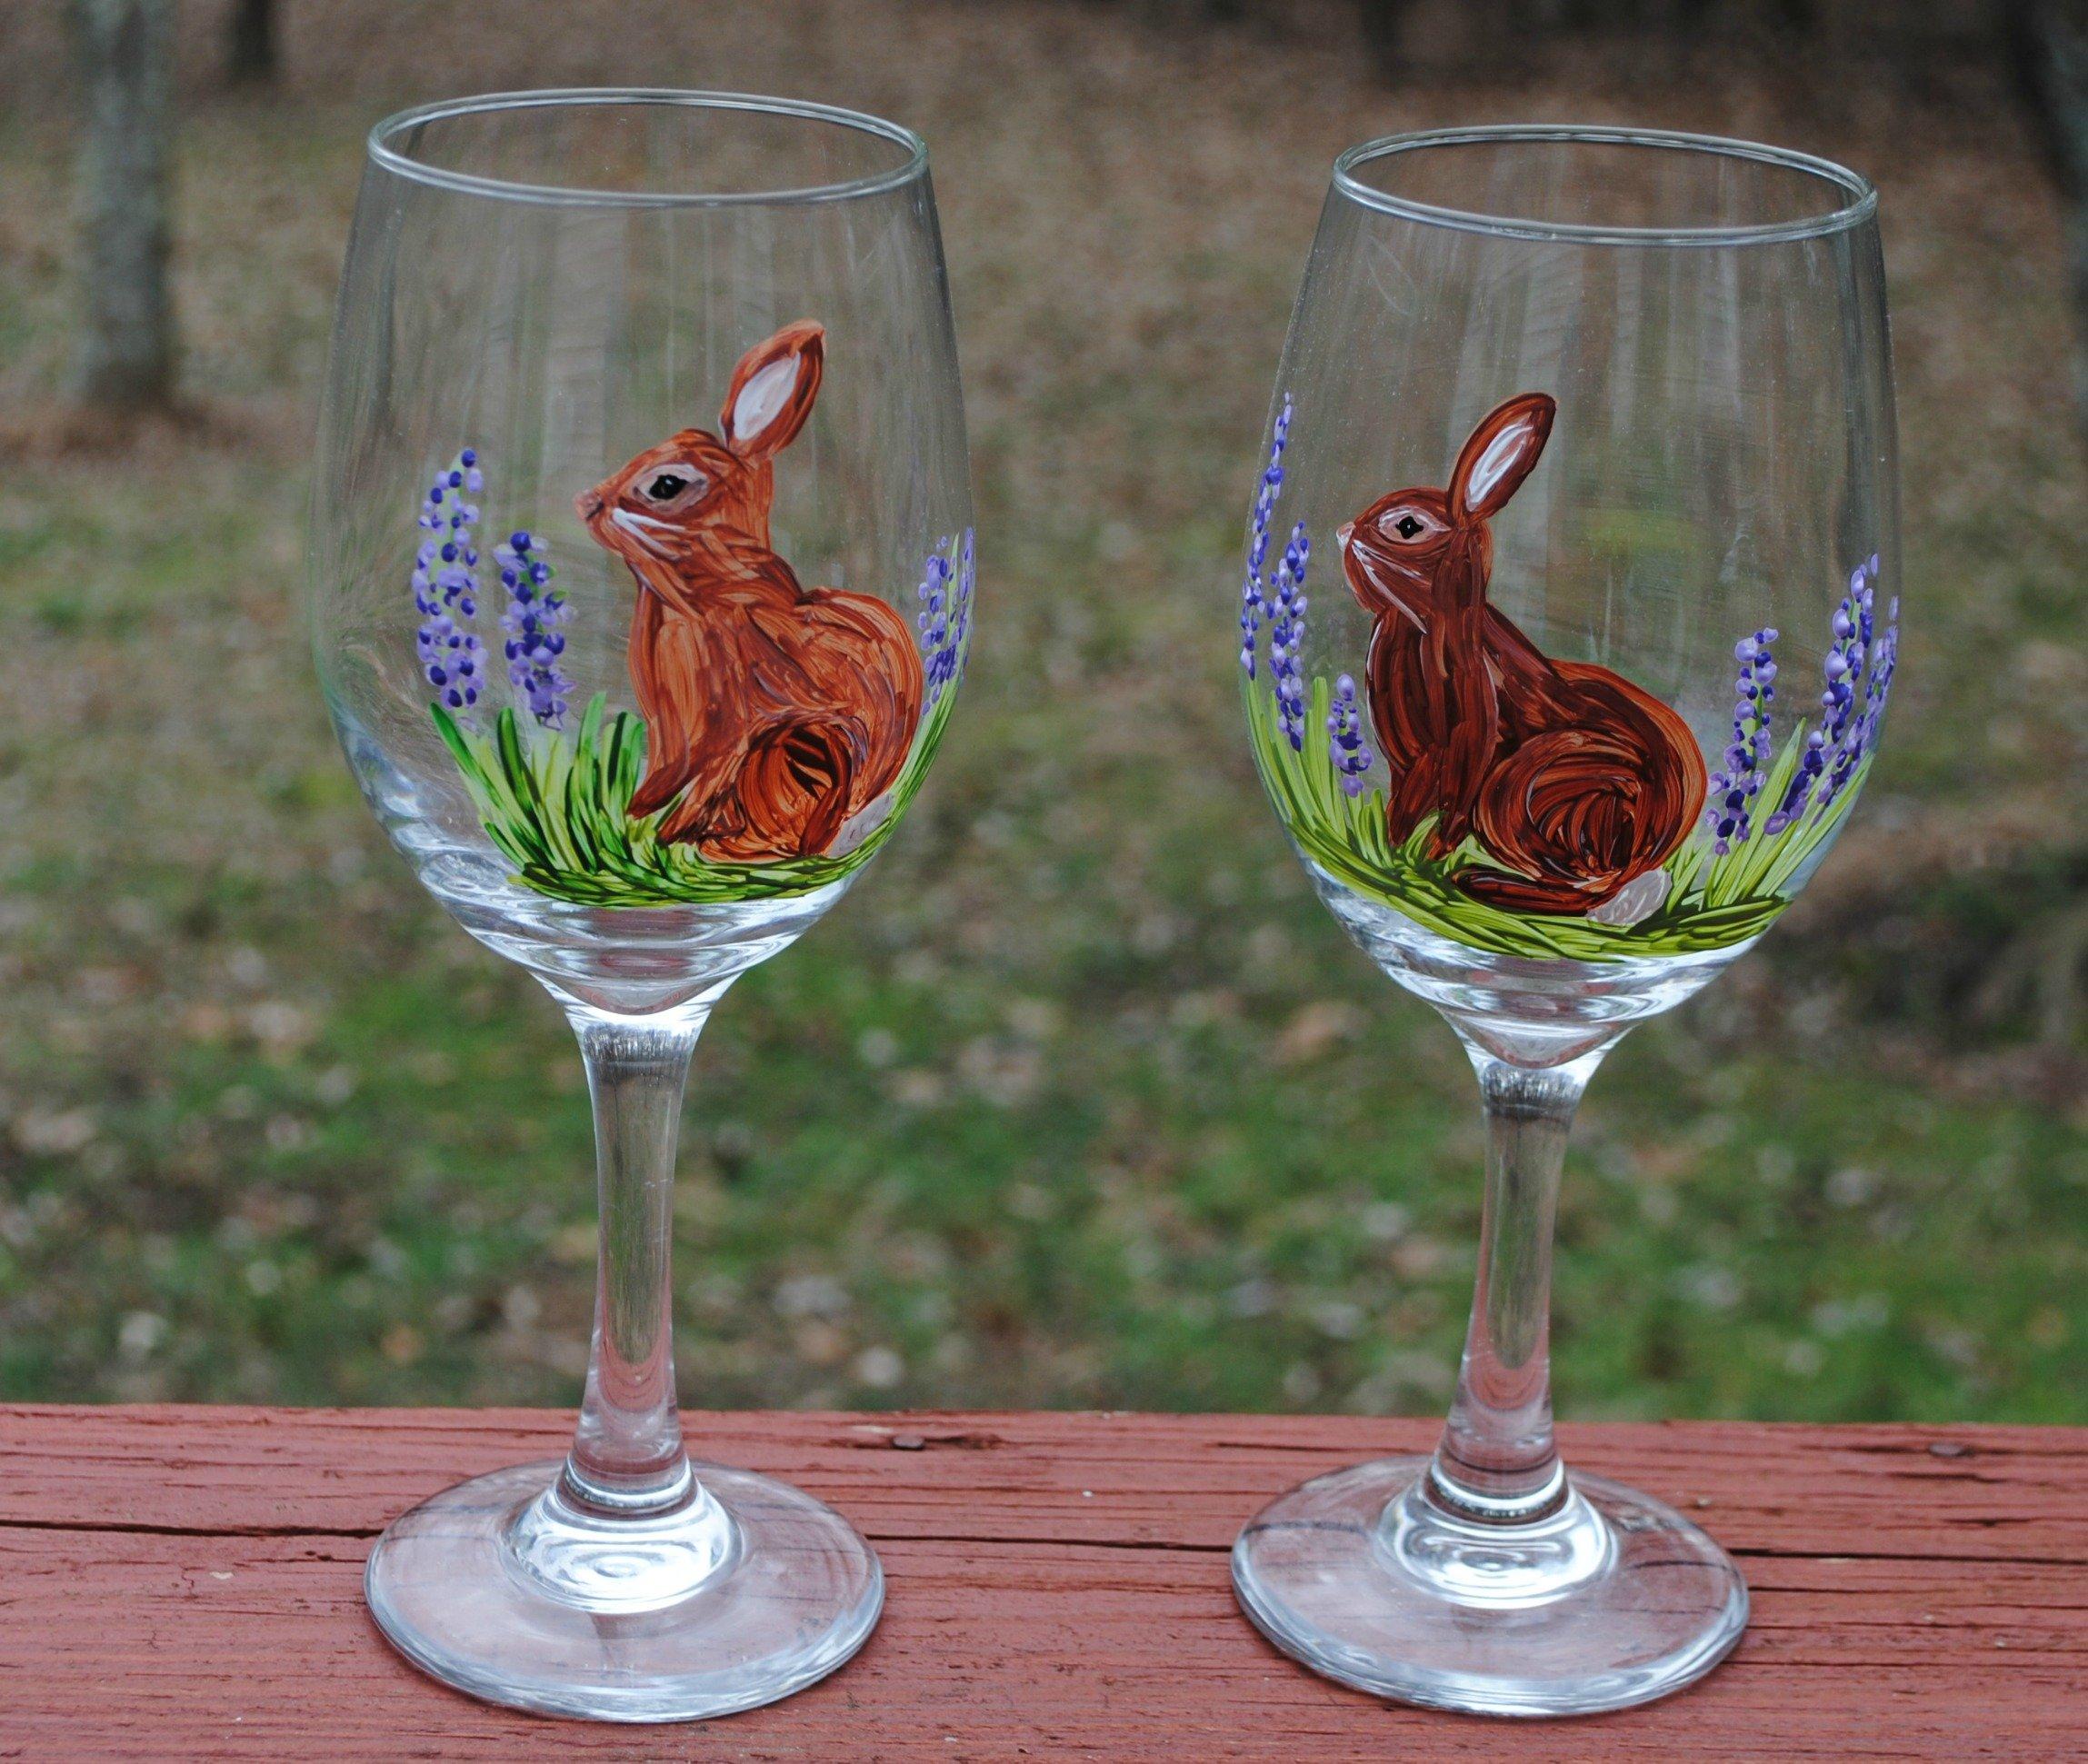 Bunny Rabbit Hand Painted 20 oz Stemmed Wine Glasses (Set of 2) Easter Kitchen Decor.